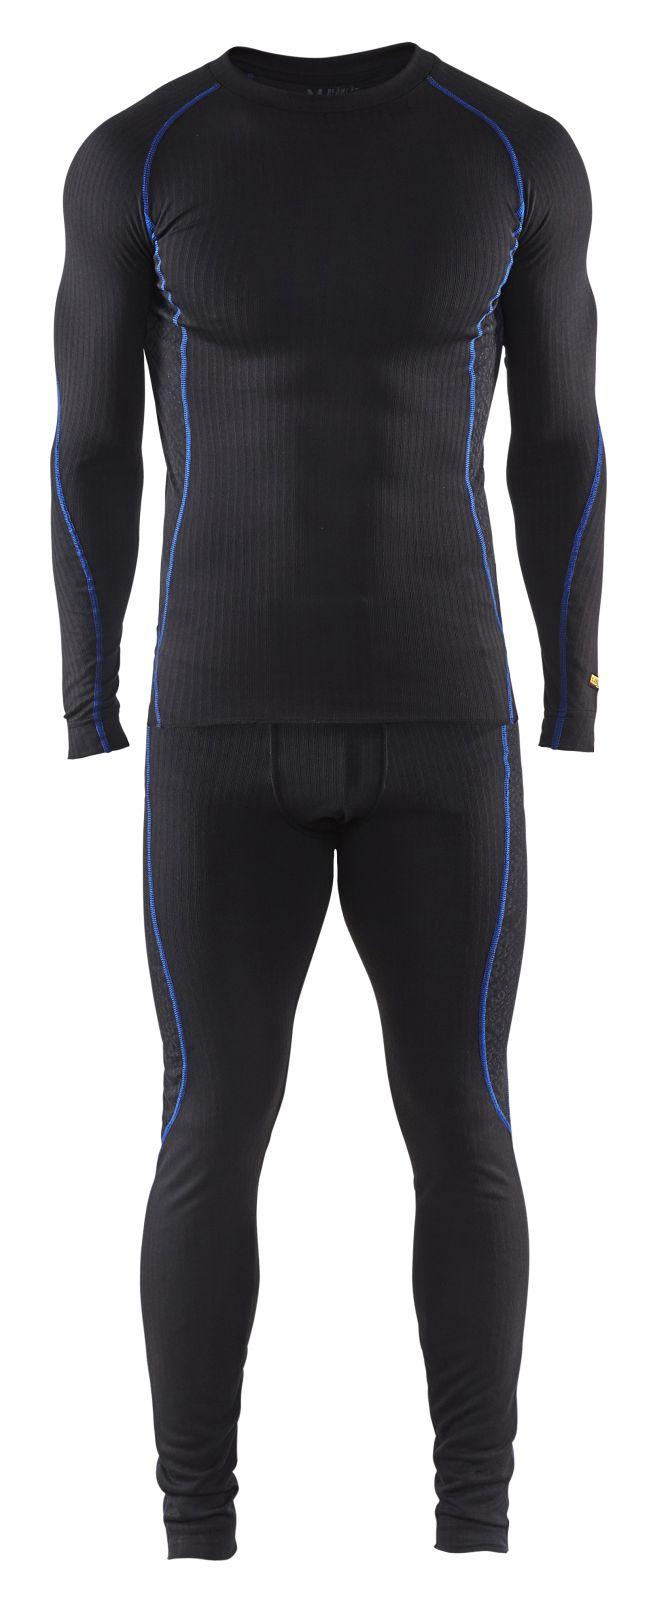 Blaklader Kleding sets 68101707 Shirt en onderbroek zwart-korenblauw(9985)